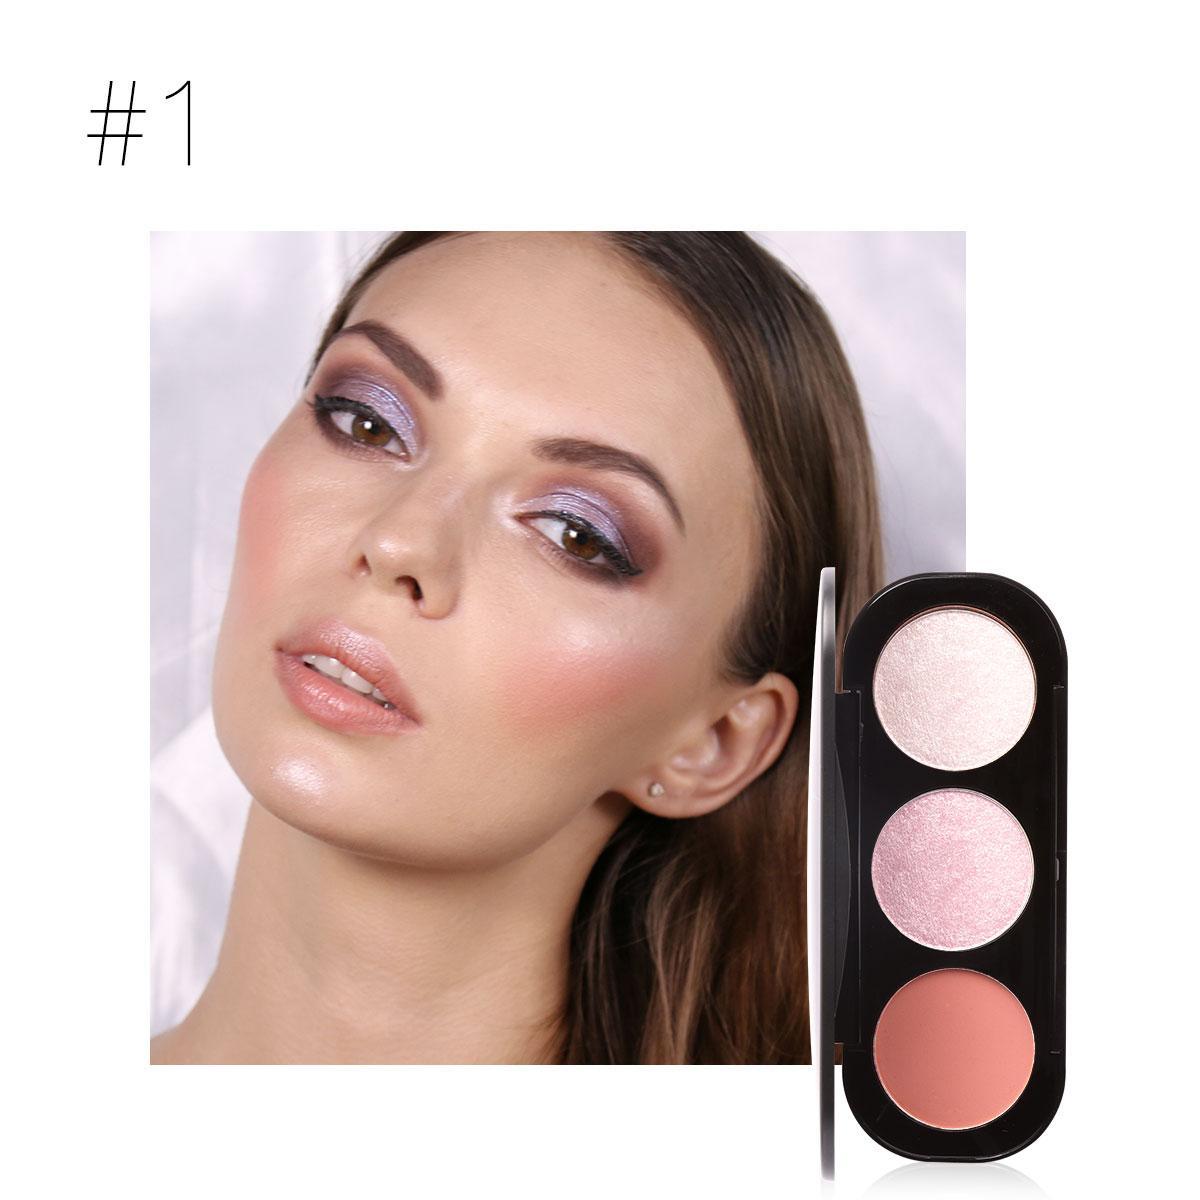 FOCALLURE 3 Color Blush Highlighter Bronzer Palette Contour Shadow Powder Face Makeup Powder #1 - intl